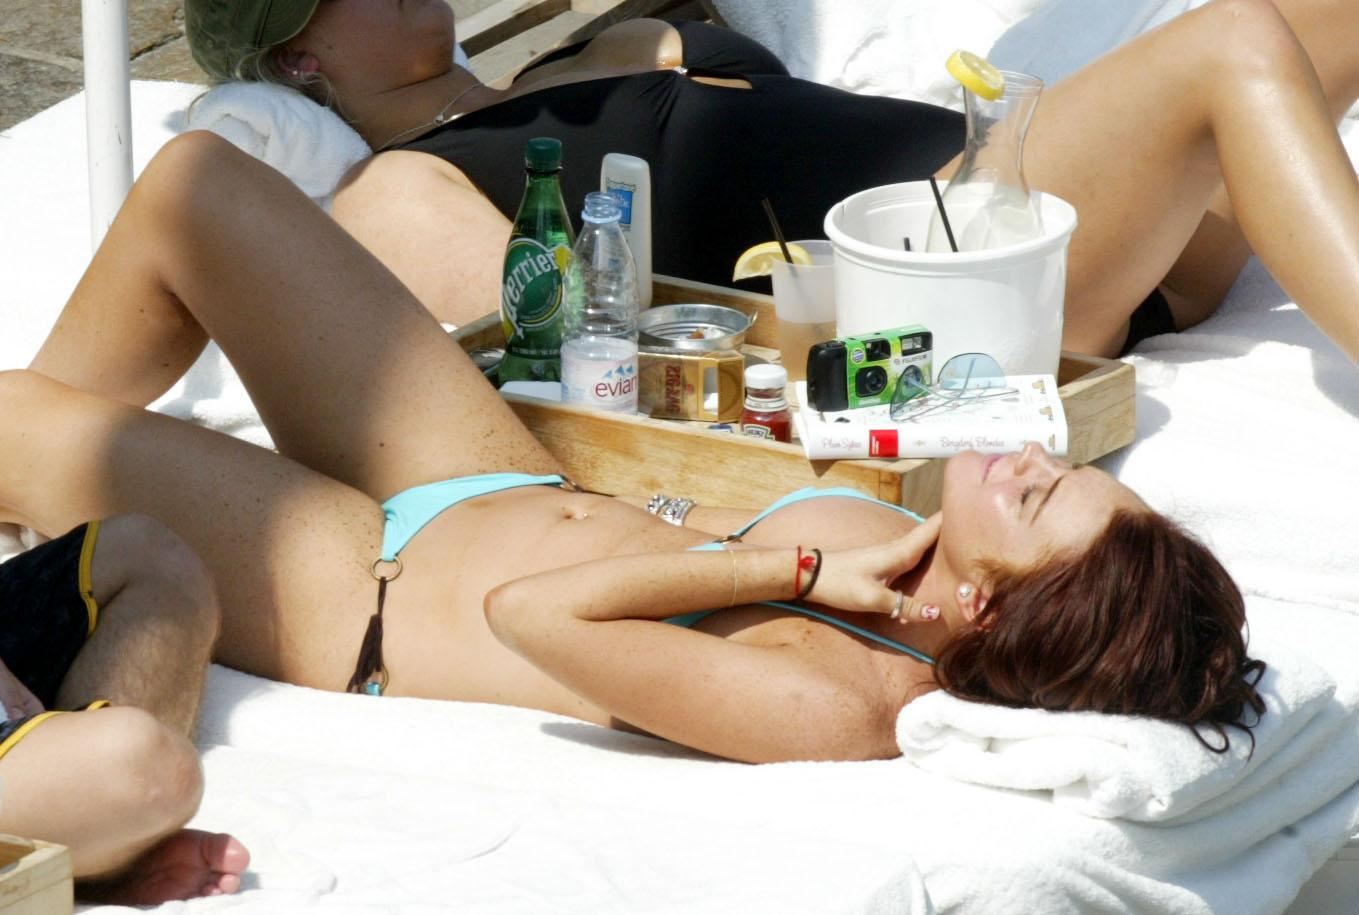 Lindsay lohan sexy very sexy hot nude-8295